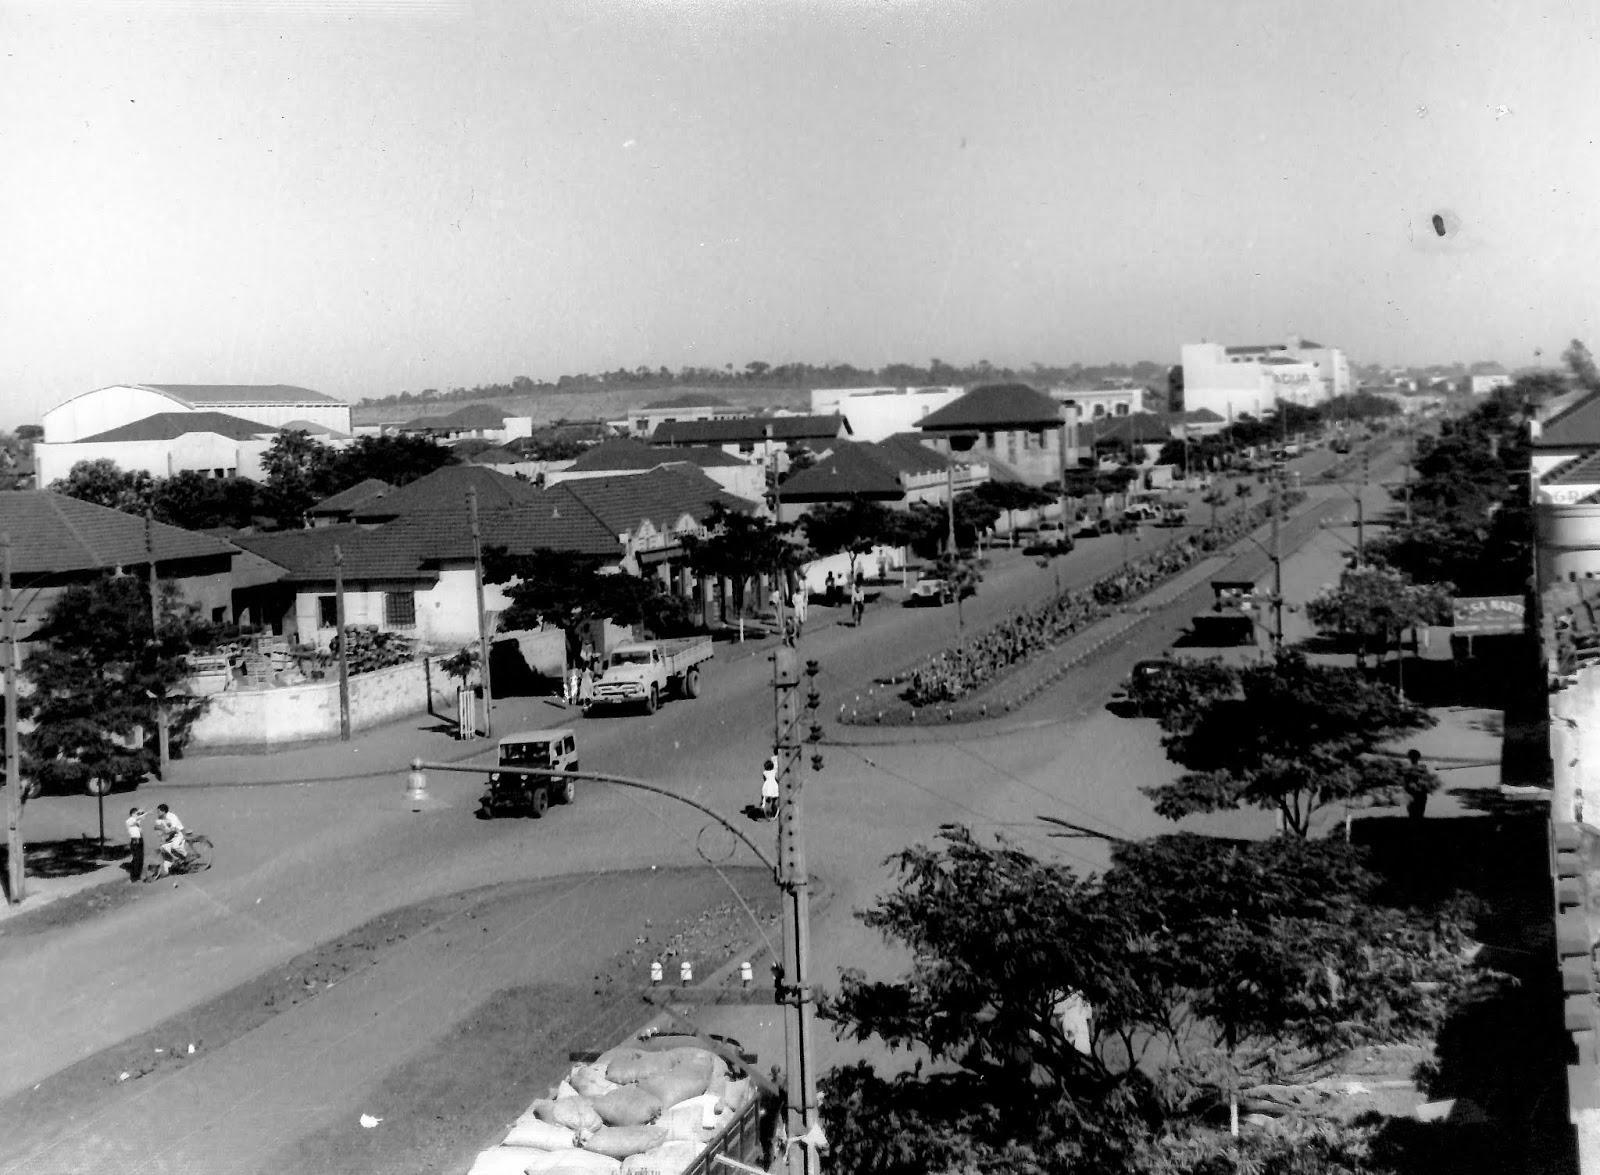 Avenida Brasil sob outro ângulo - Década de 1950